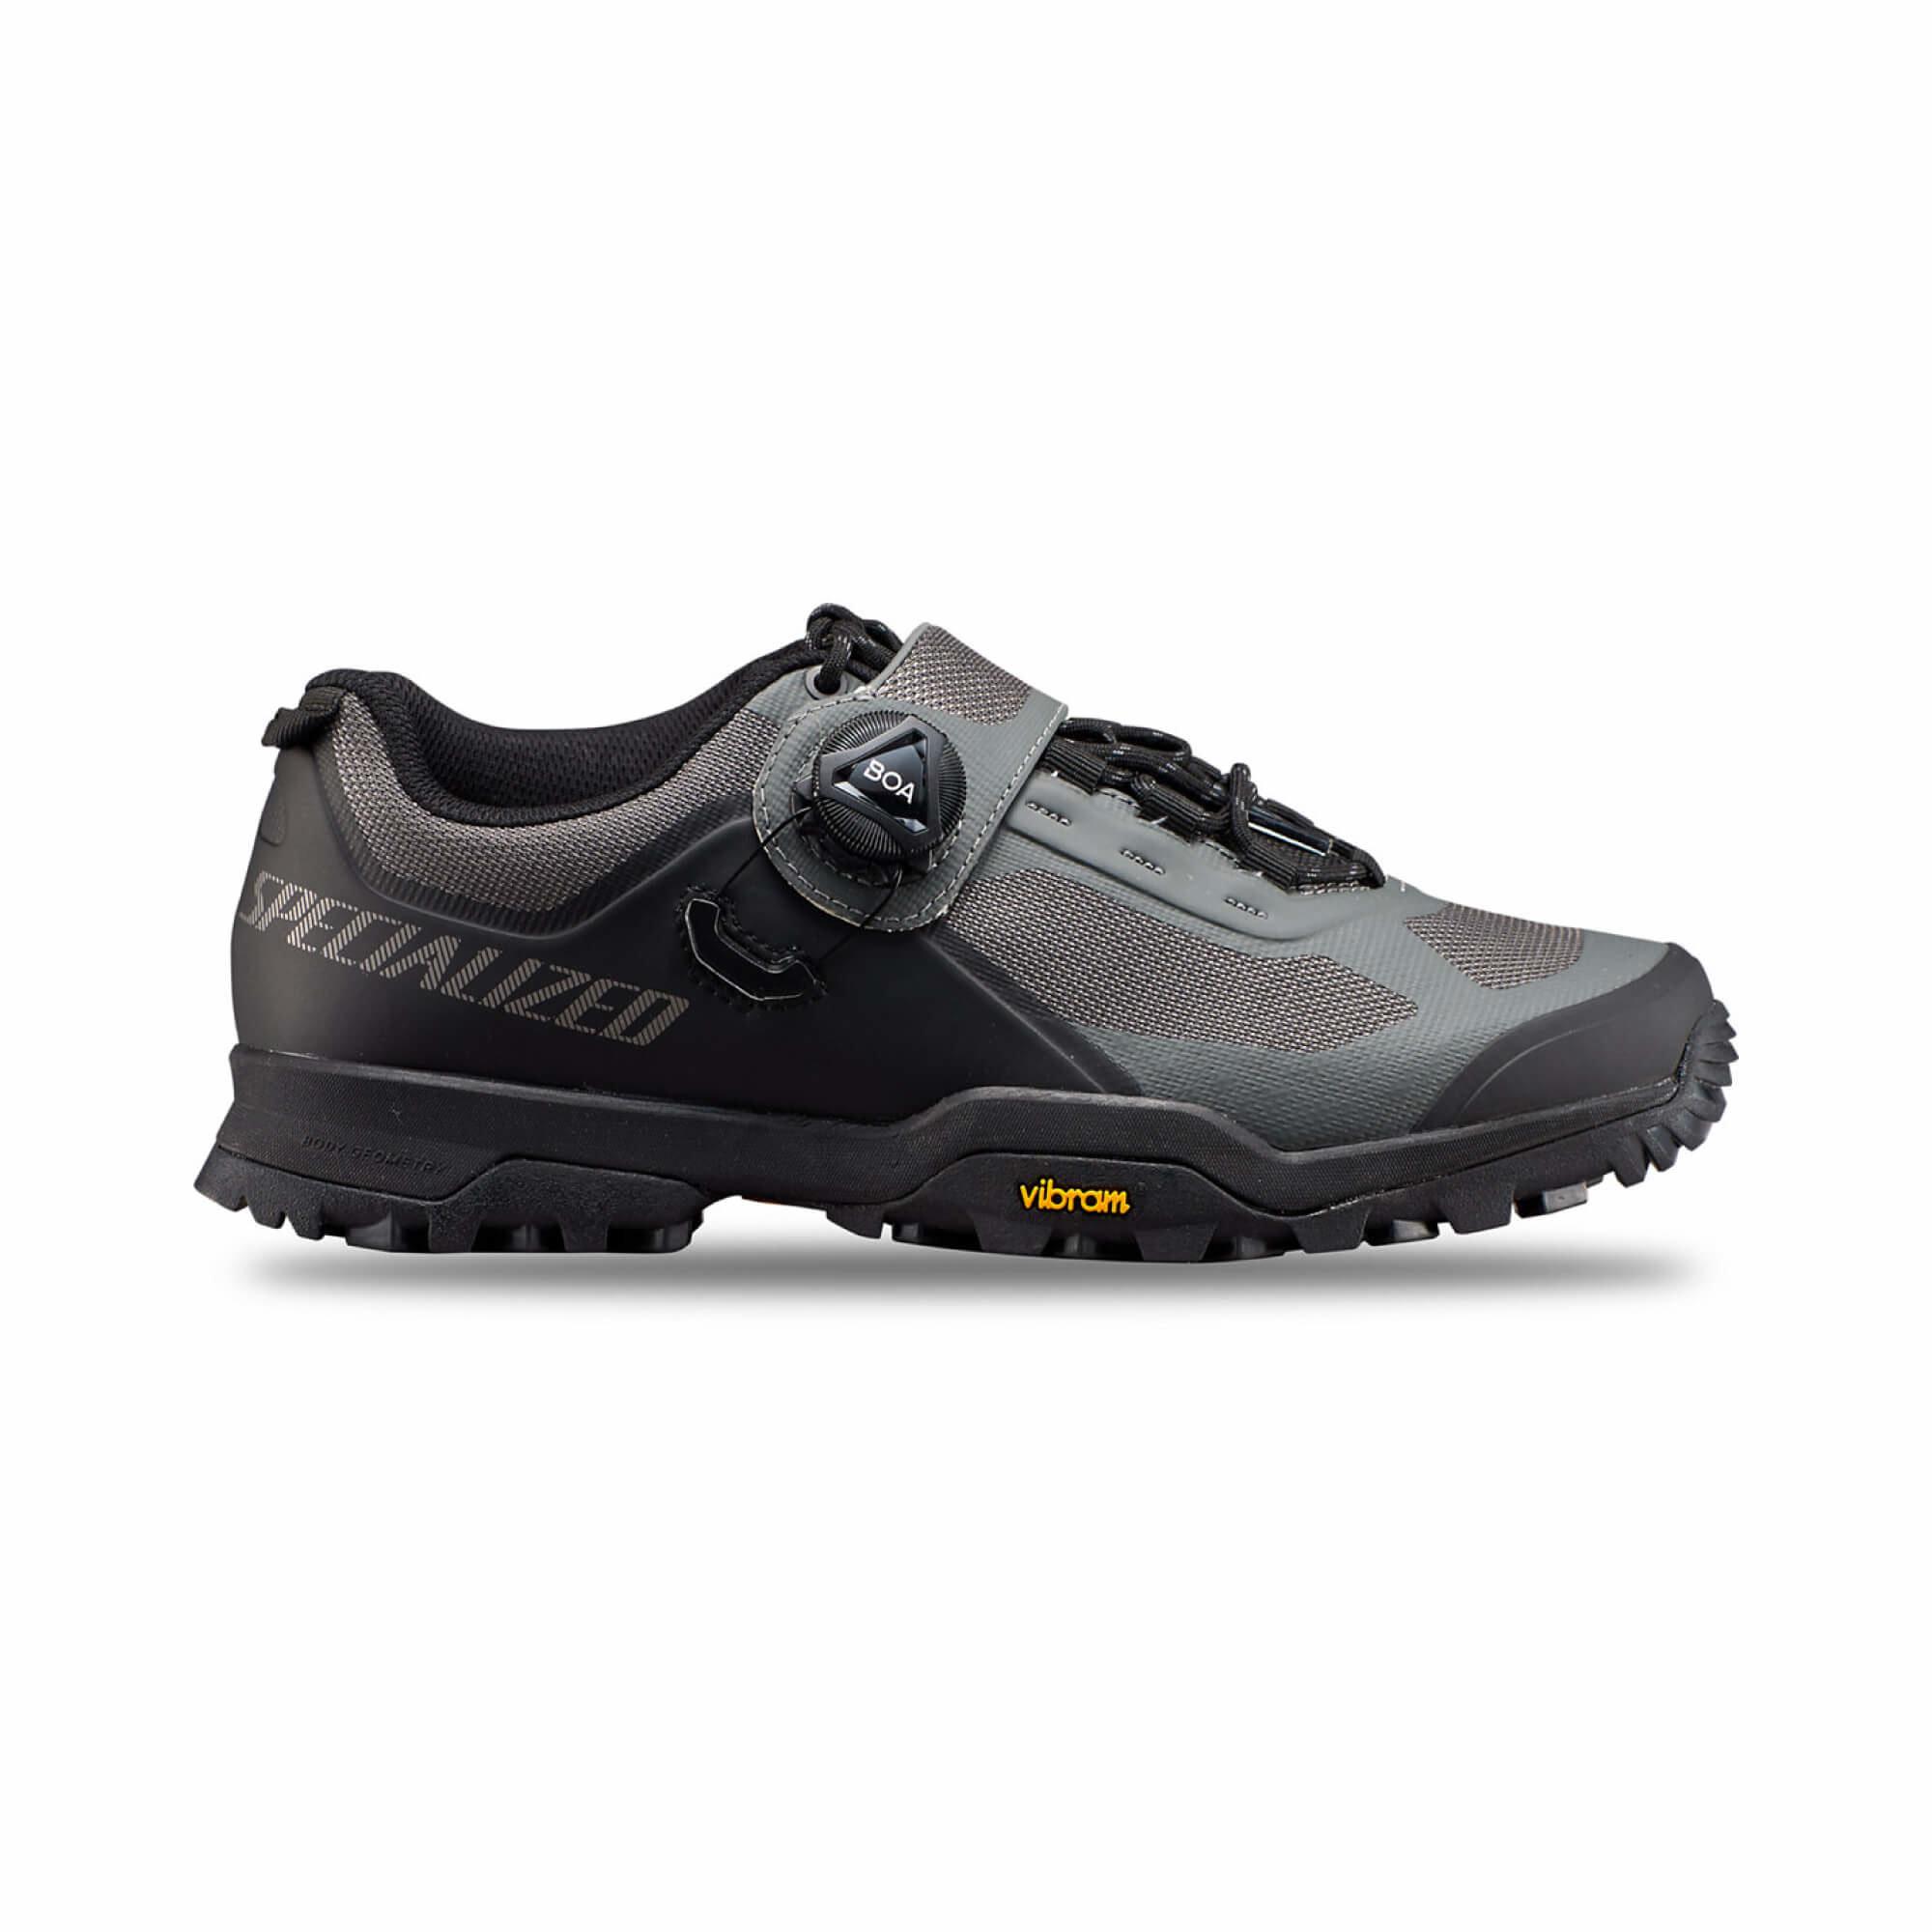 Rime 2.0 Mountain Bike Shoes-8